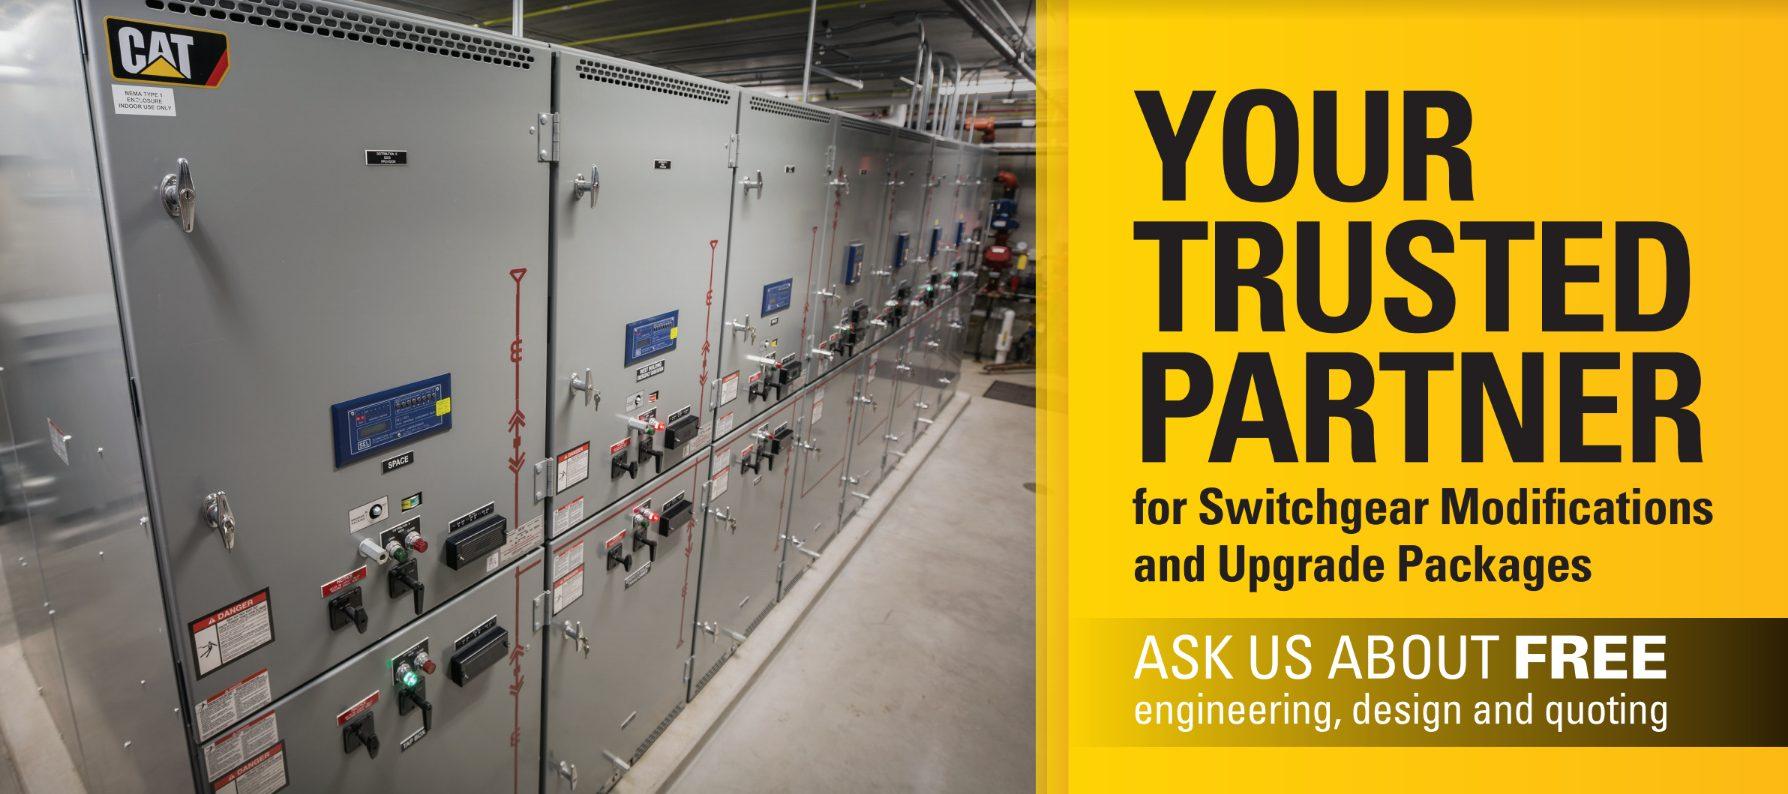 Switchgear maintenance services